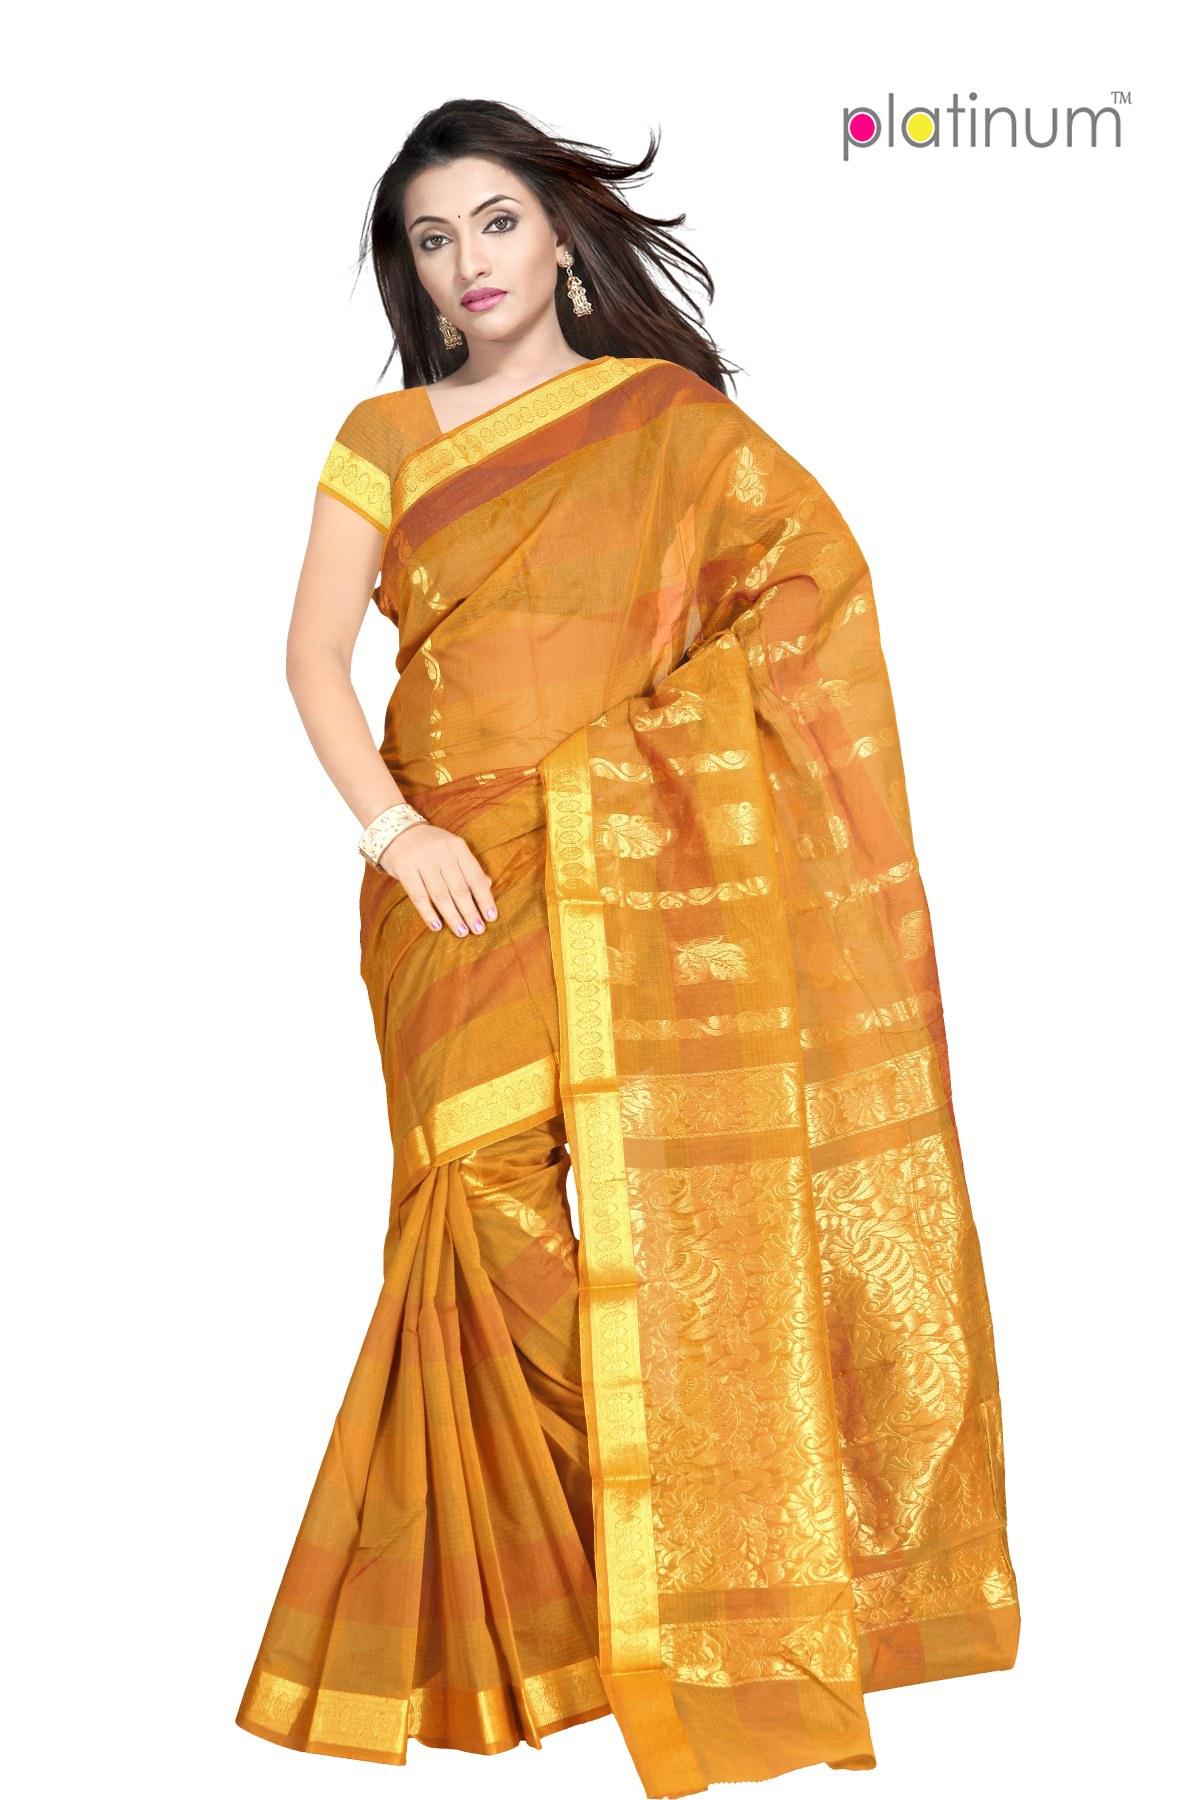 deep sunray designer zari saree ps298 online shopping for silk sarees by platinum online shopping. Black Bedroom Furniture Sets. Home Design Ideas